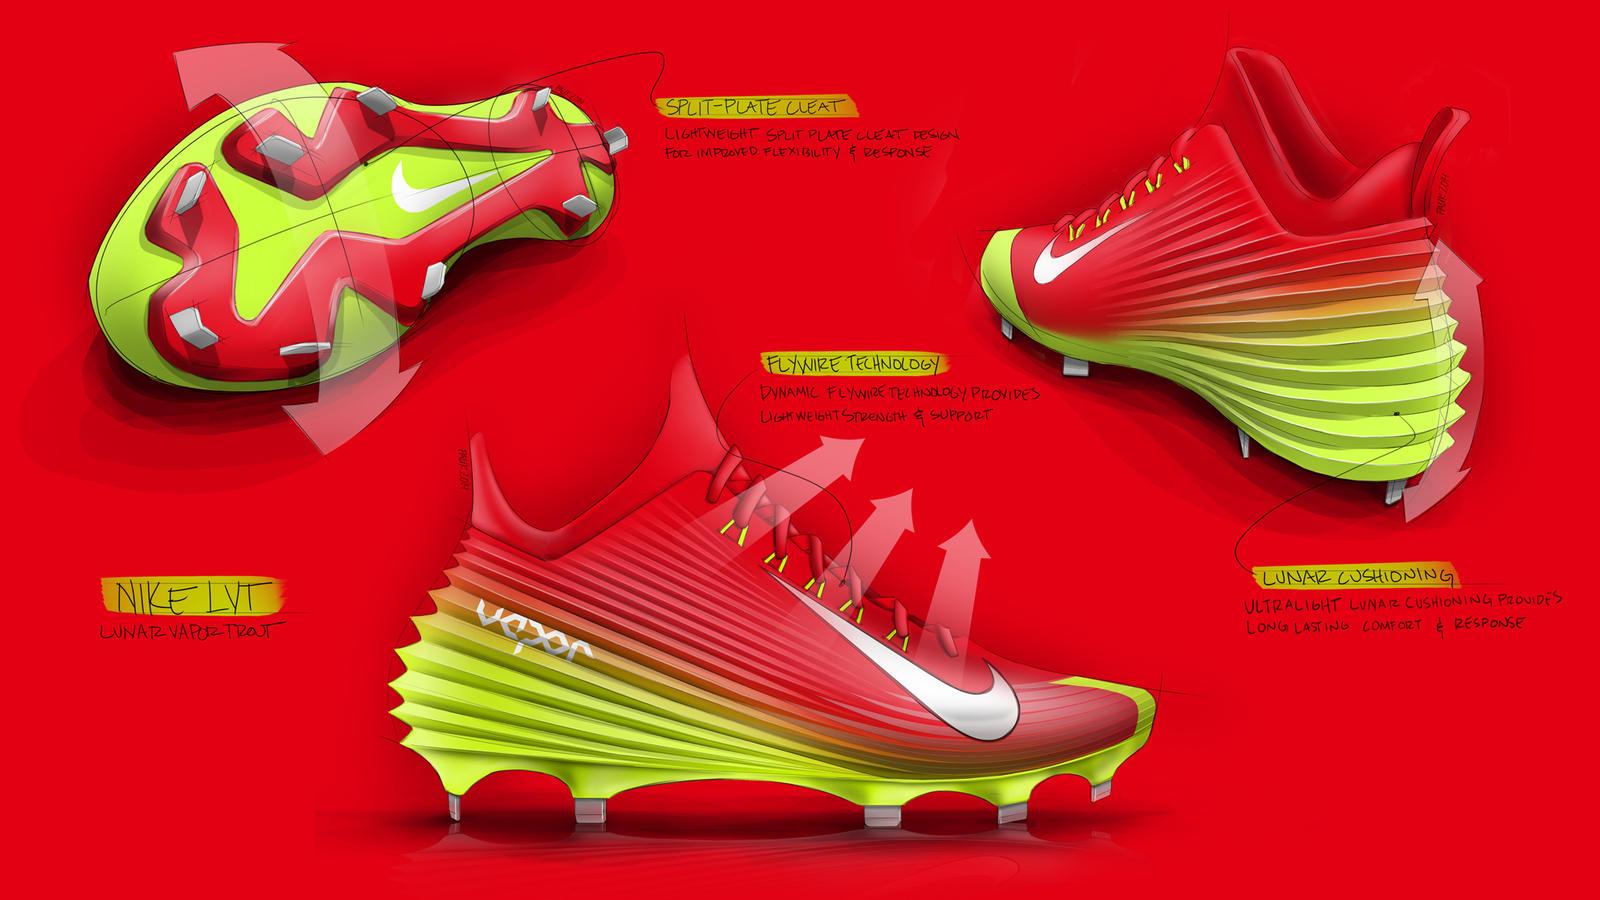 Nike Baseball Unveils New Vapor